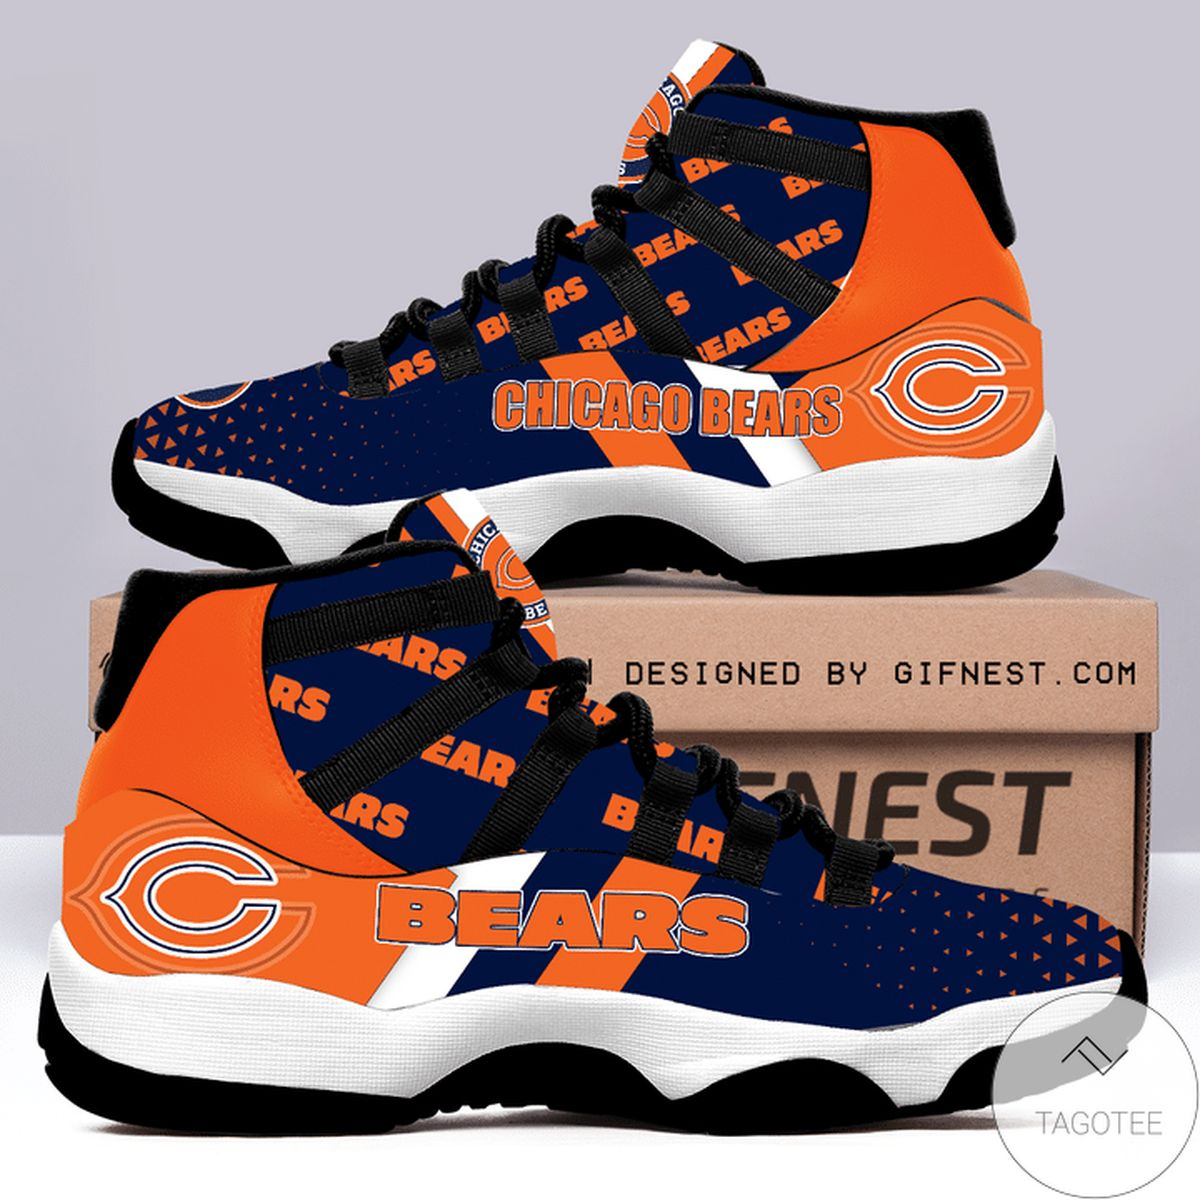 Top Selling Chicago Bears Air Jordan 11 Shoes